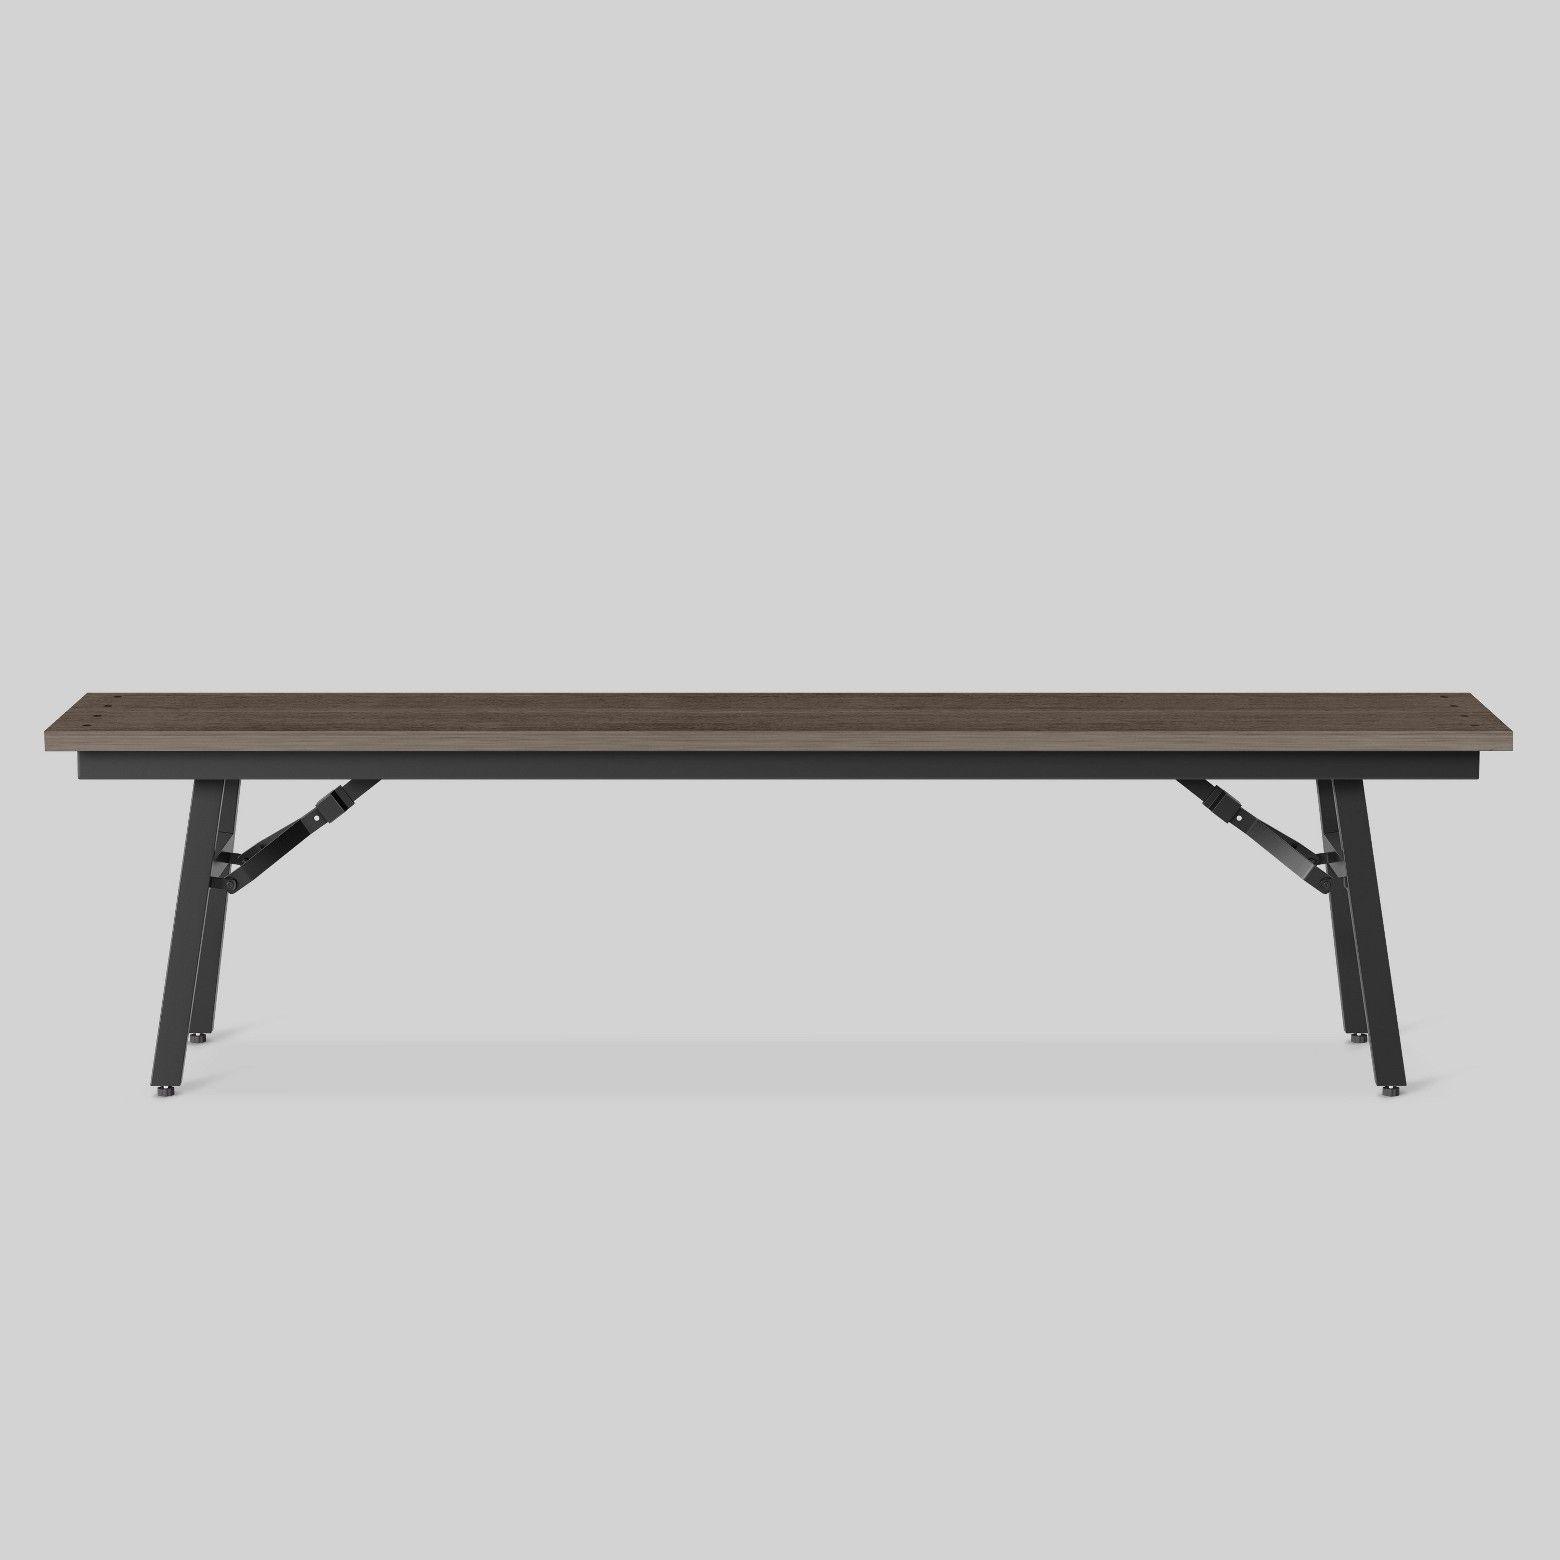 Mantega Faux Wood Folding Patio Bench